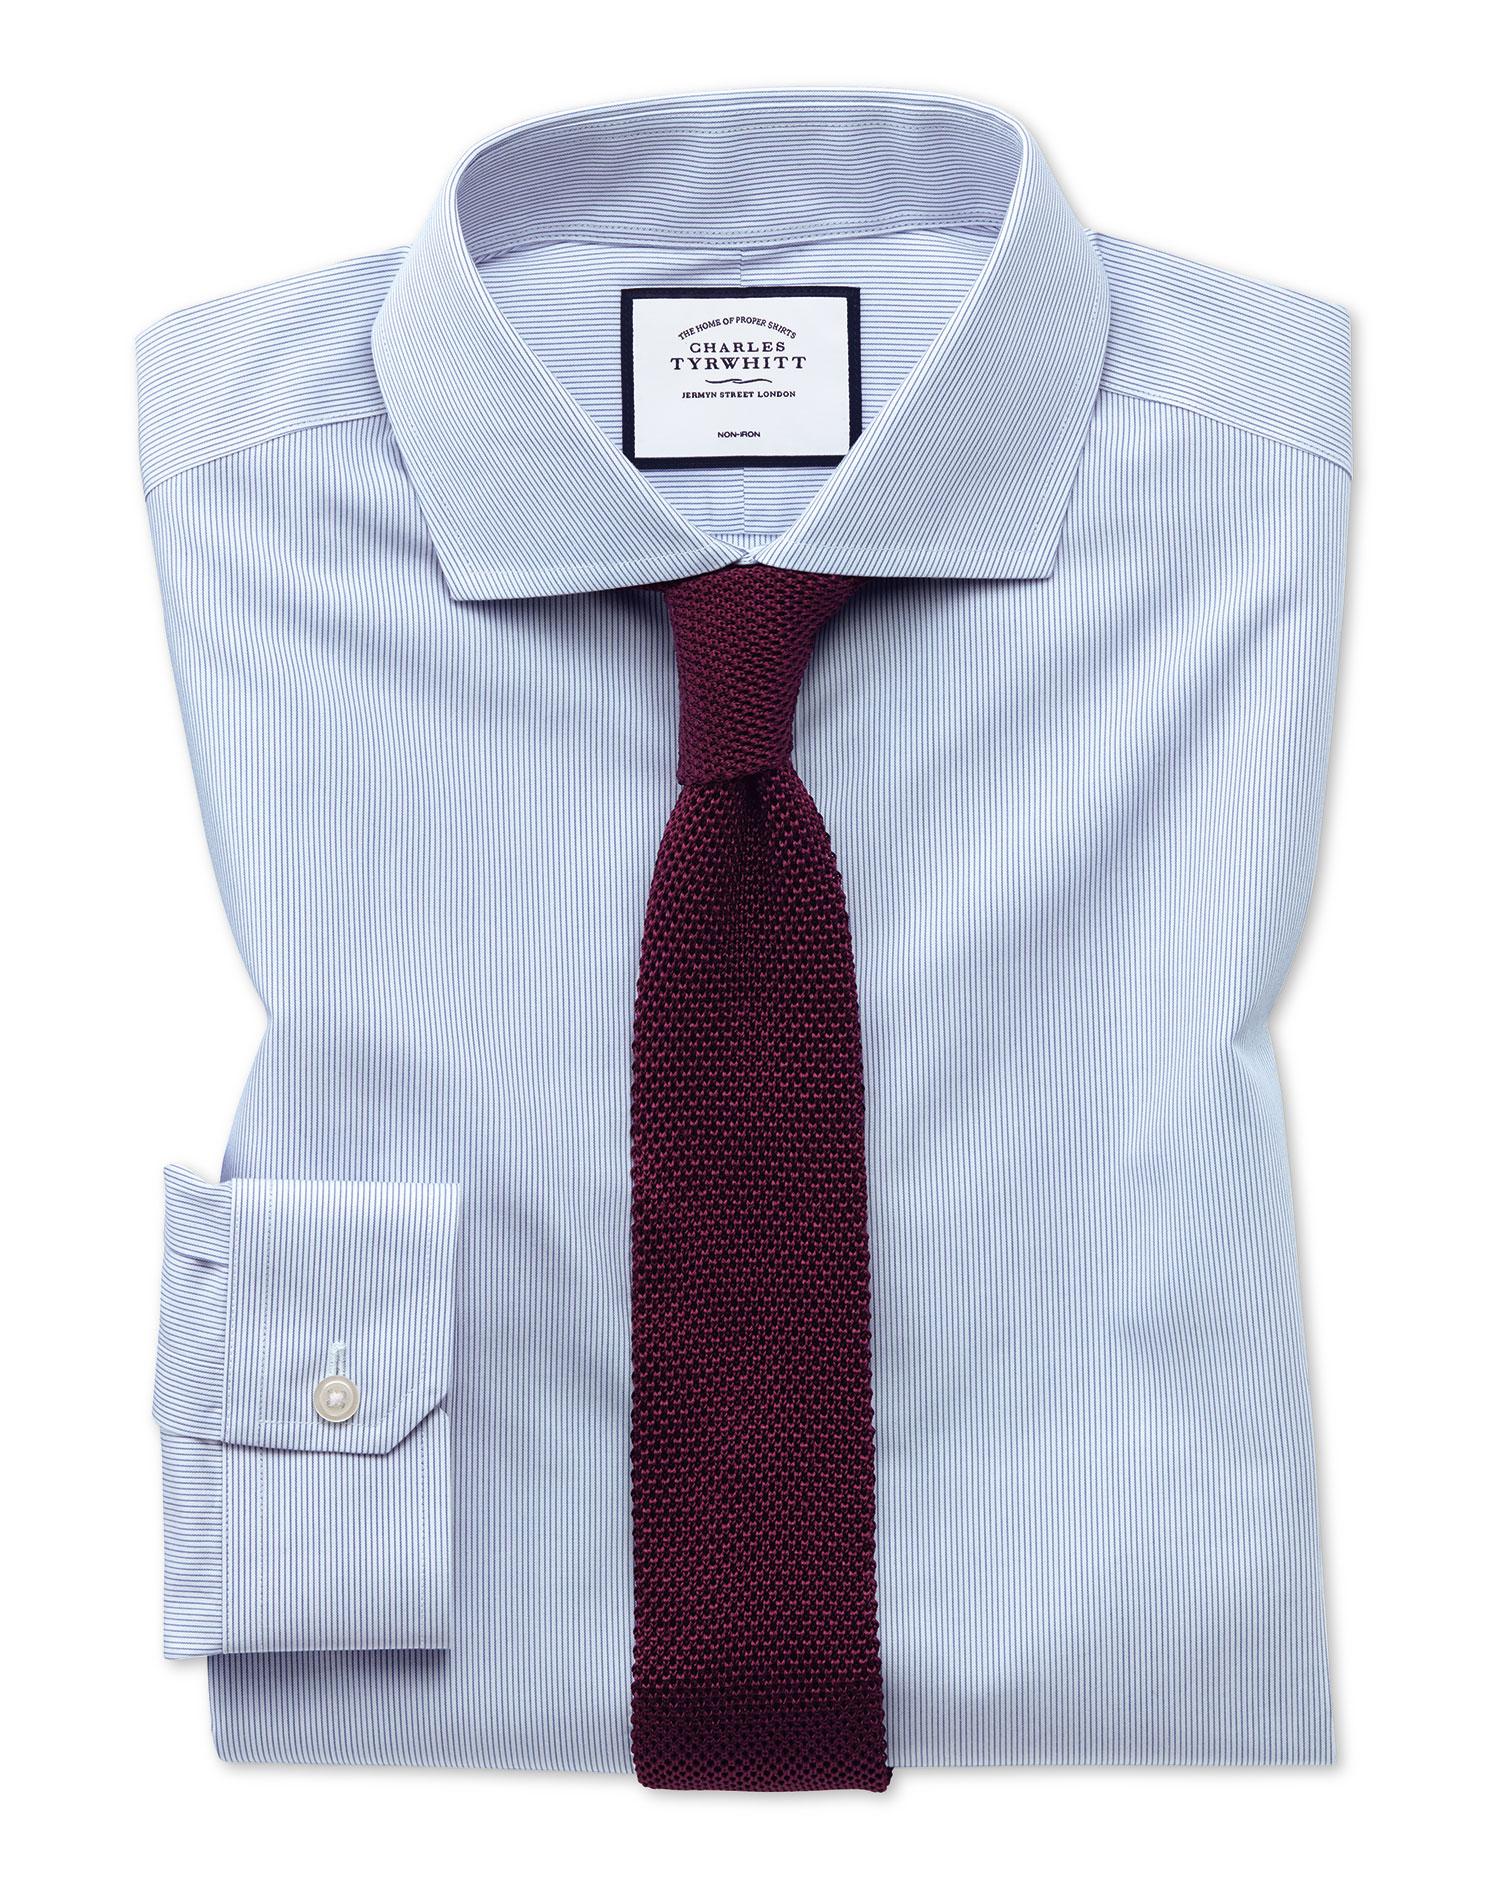 Super Slim Fit Non-Iron Blue Stripe Tyrwhitt Cool Cotton Formal Shirt Single Cuff Size 17/35 by Char